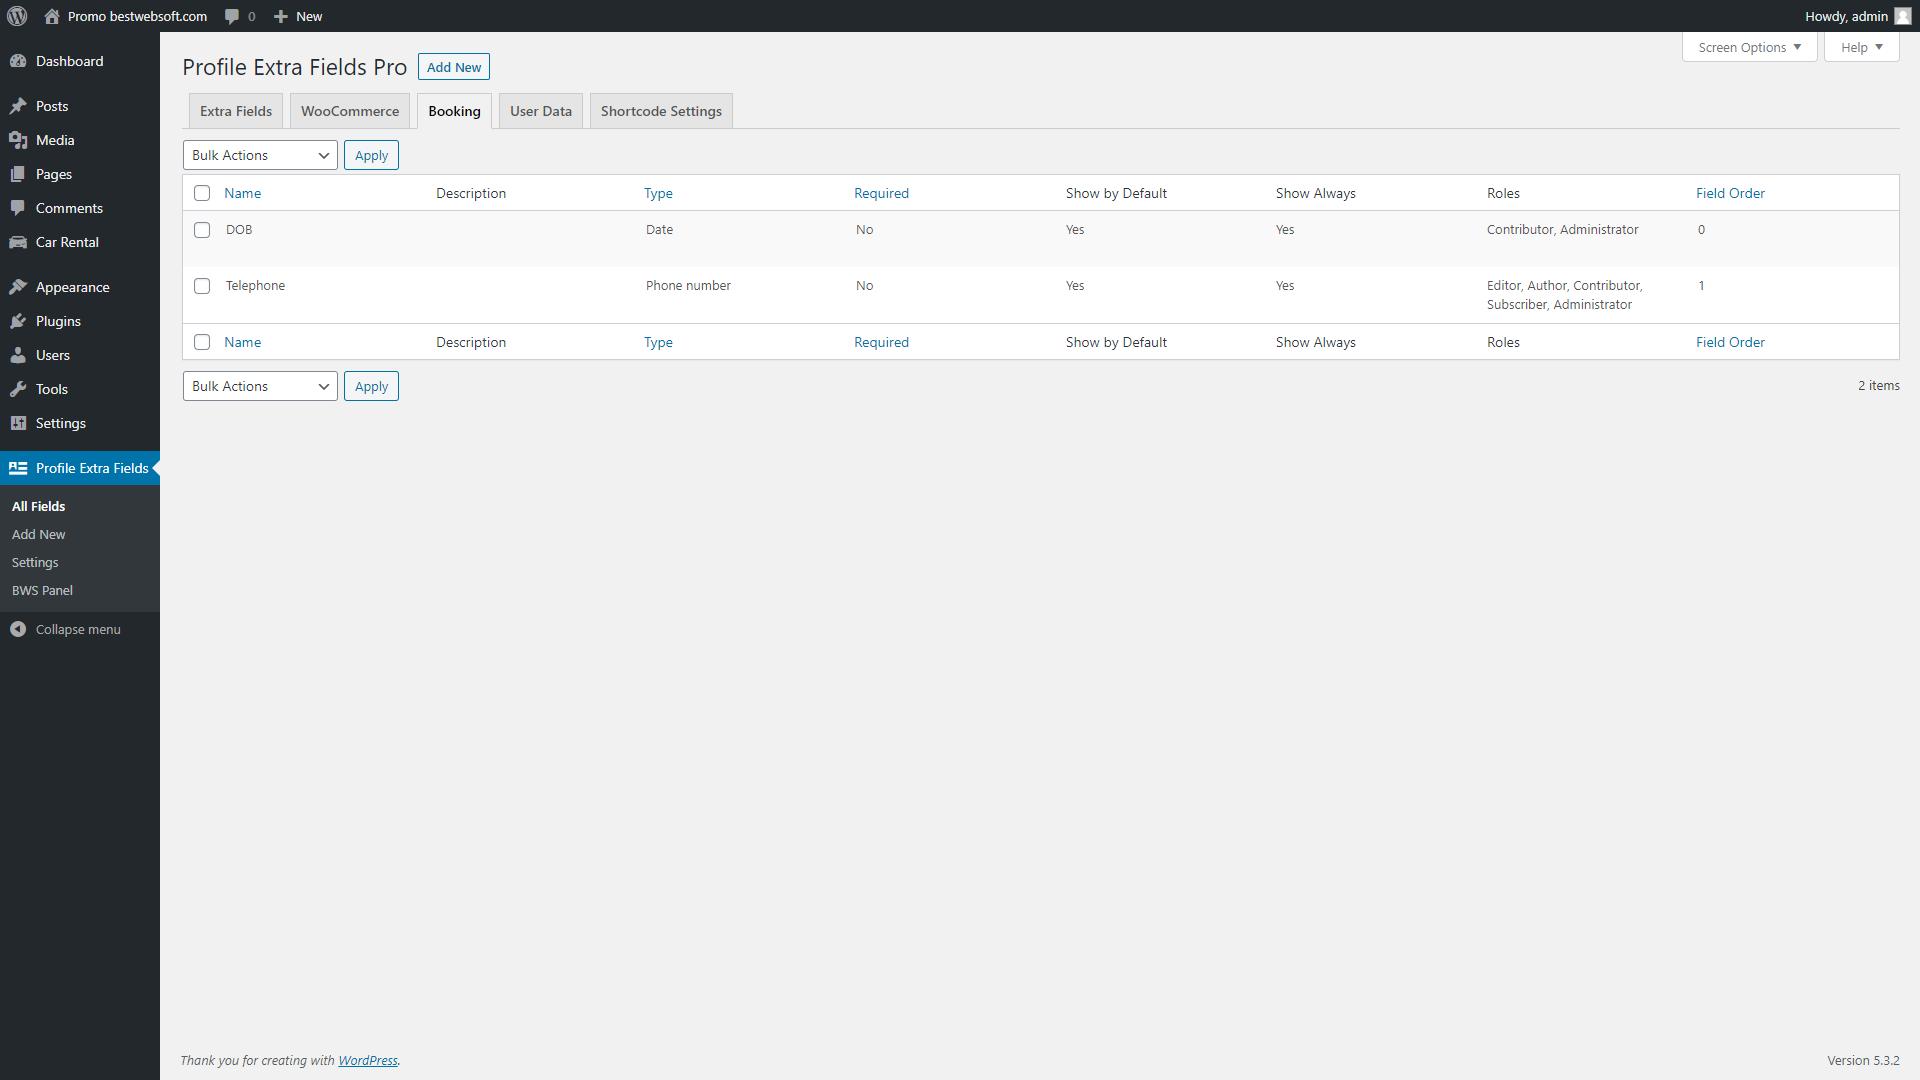 profile extra fields screenshot 18